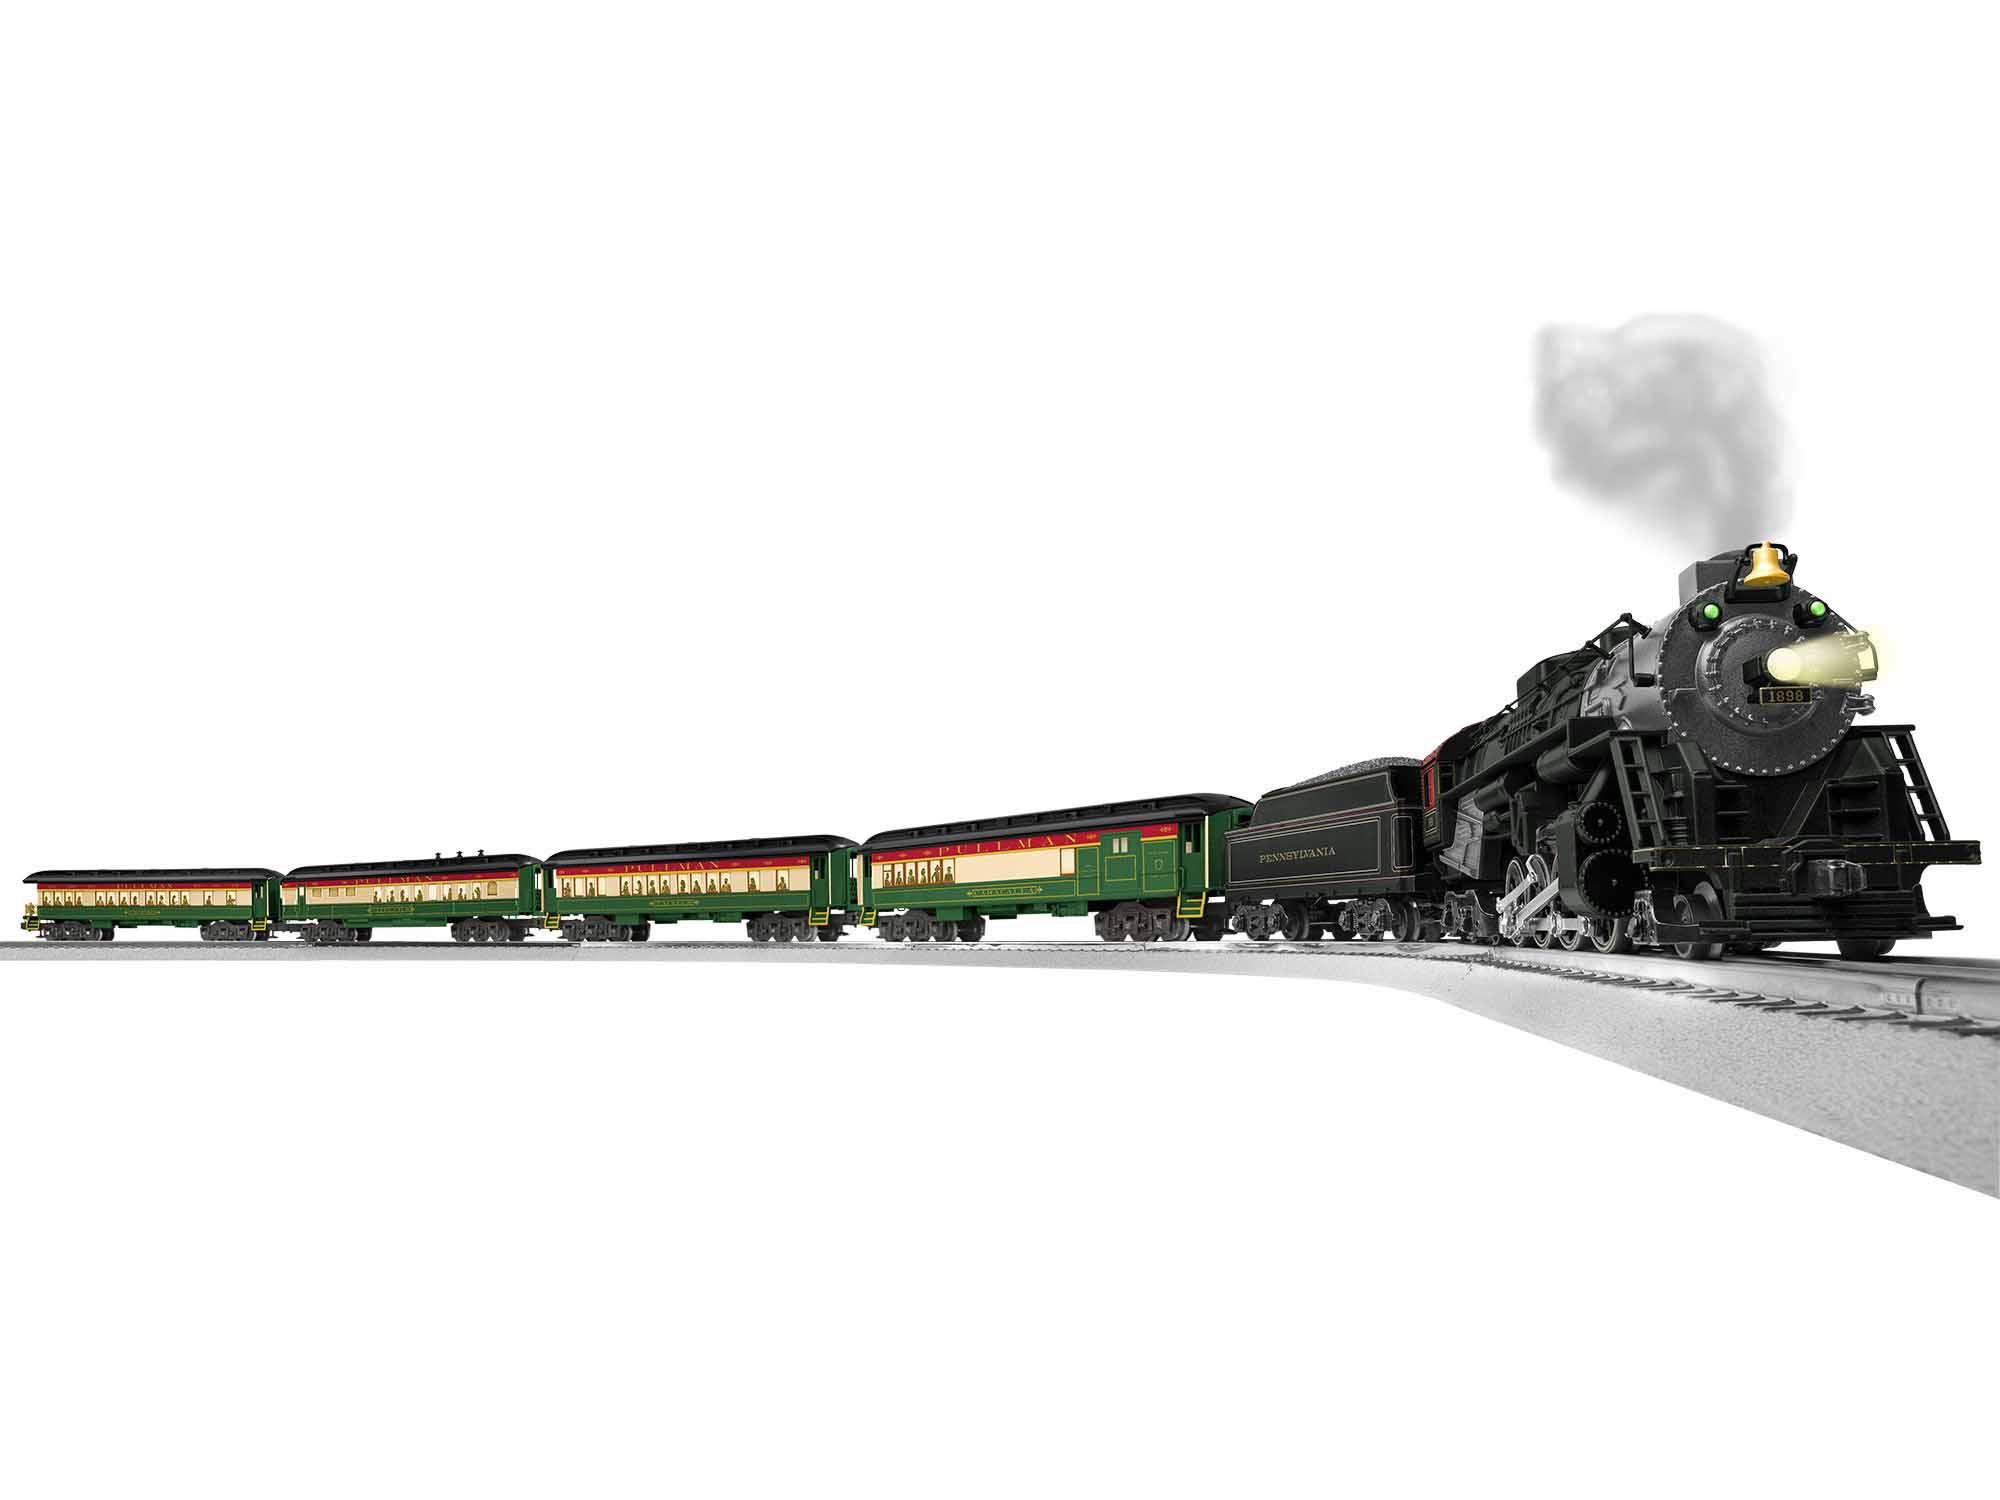 Lionel 1922070 O Pennsylvania Limited Train-Only Passenger Set 3-Rail LionChief+ 2.0 Berkshire 2-8-4 4 Cars